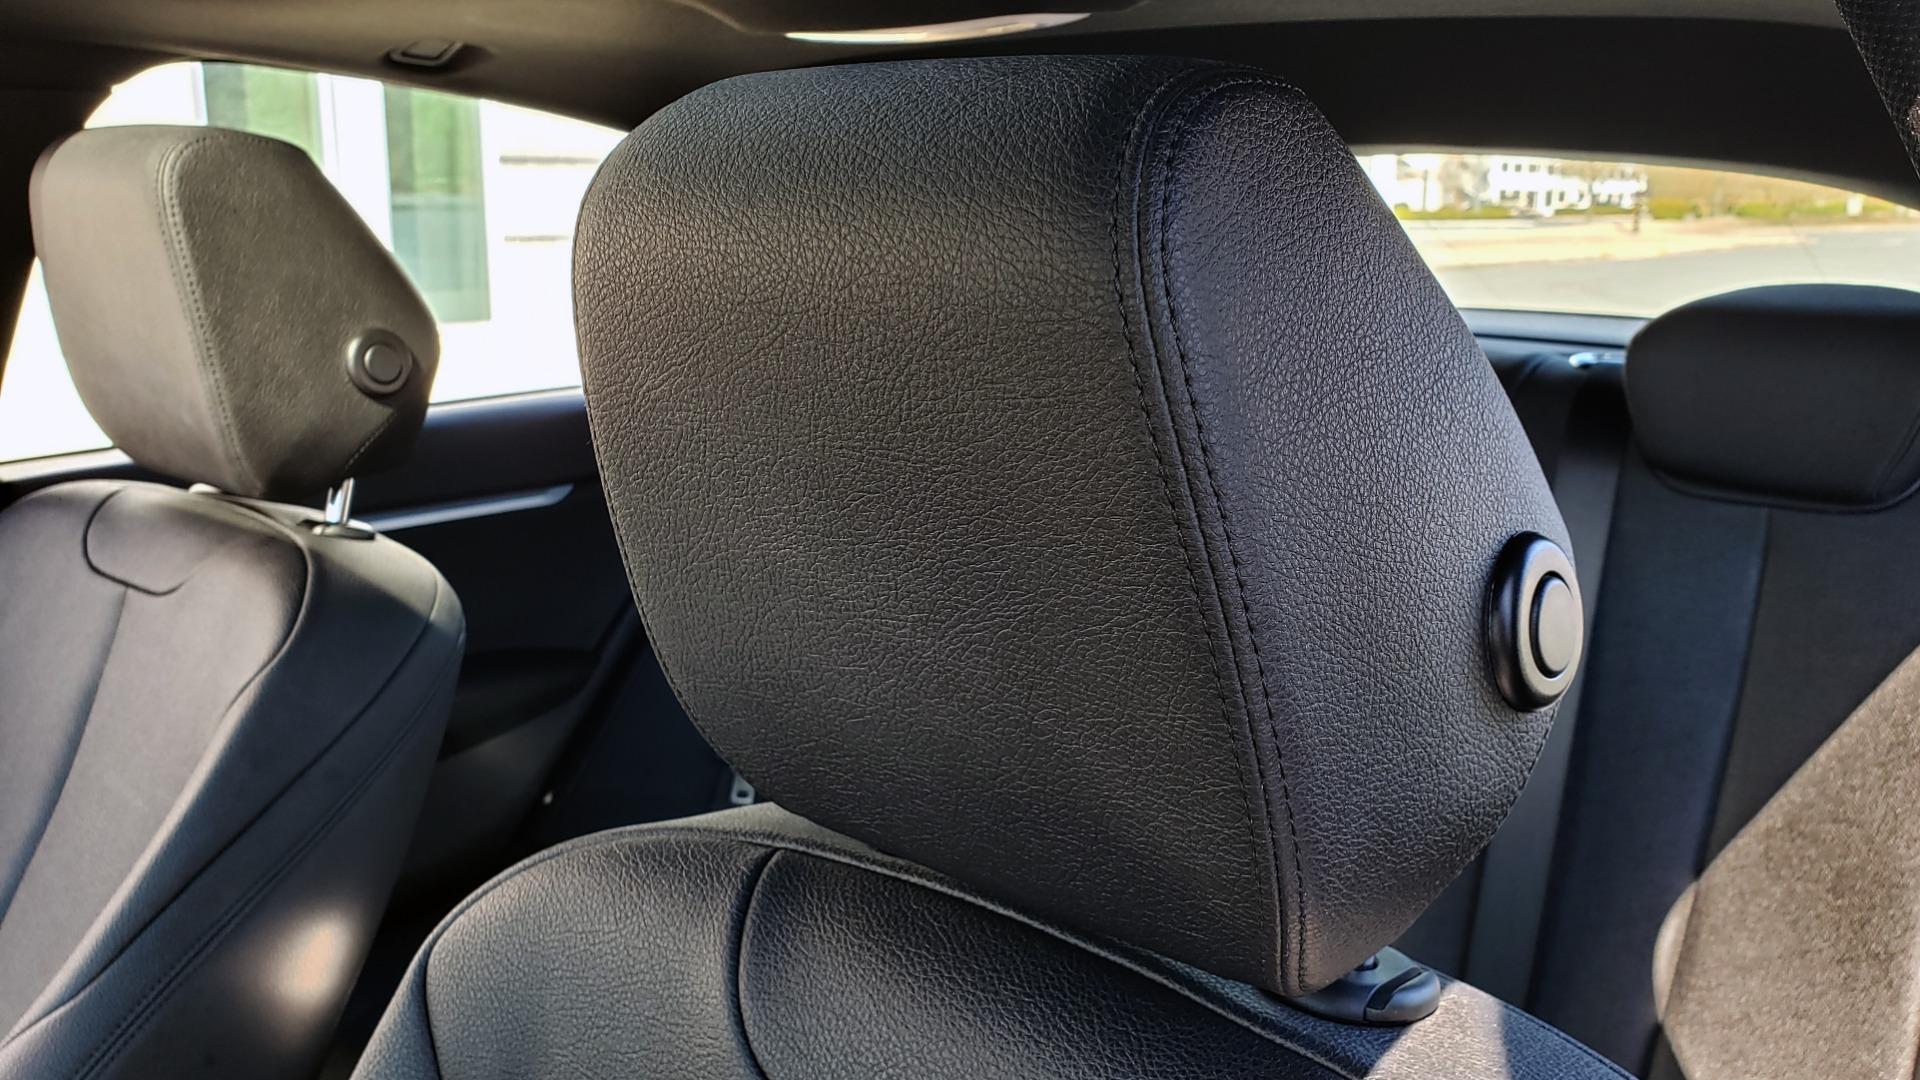 Used 2018 BMW 4 SERIES 430IXDRIVE / PREMIUM / NAV / SUNROOF / ESSENTIALS PKG for sale $27,795 at Formula Imports in Charlotte NC 28227 60